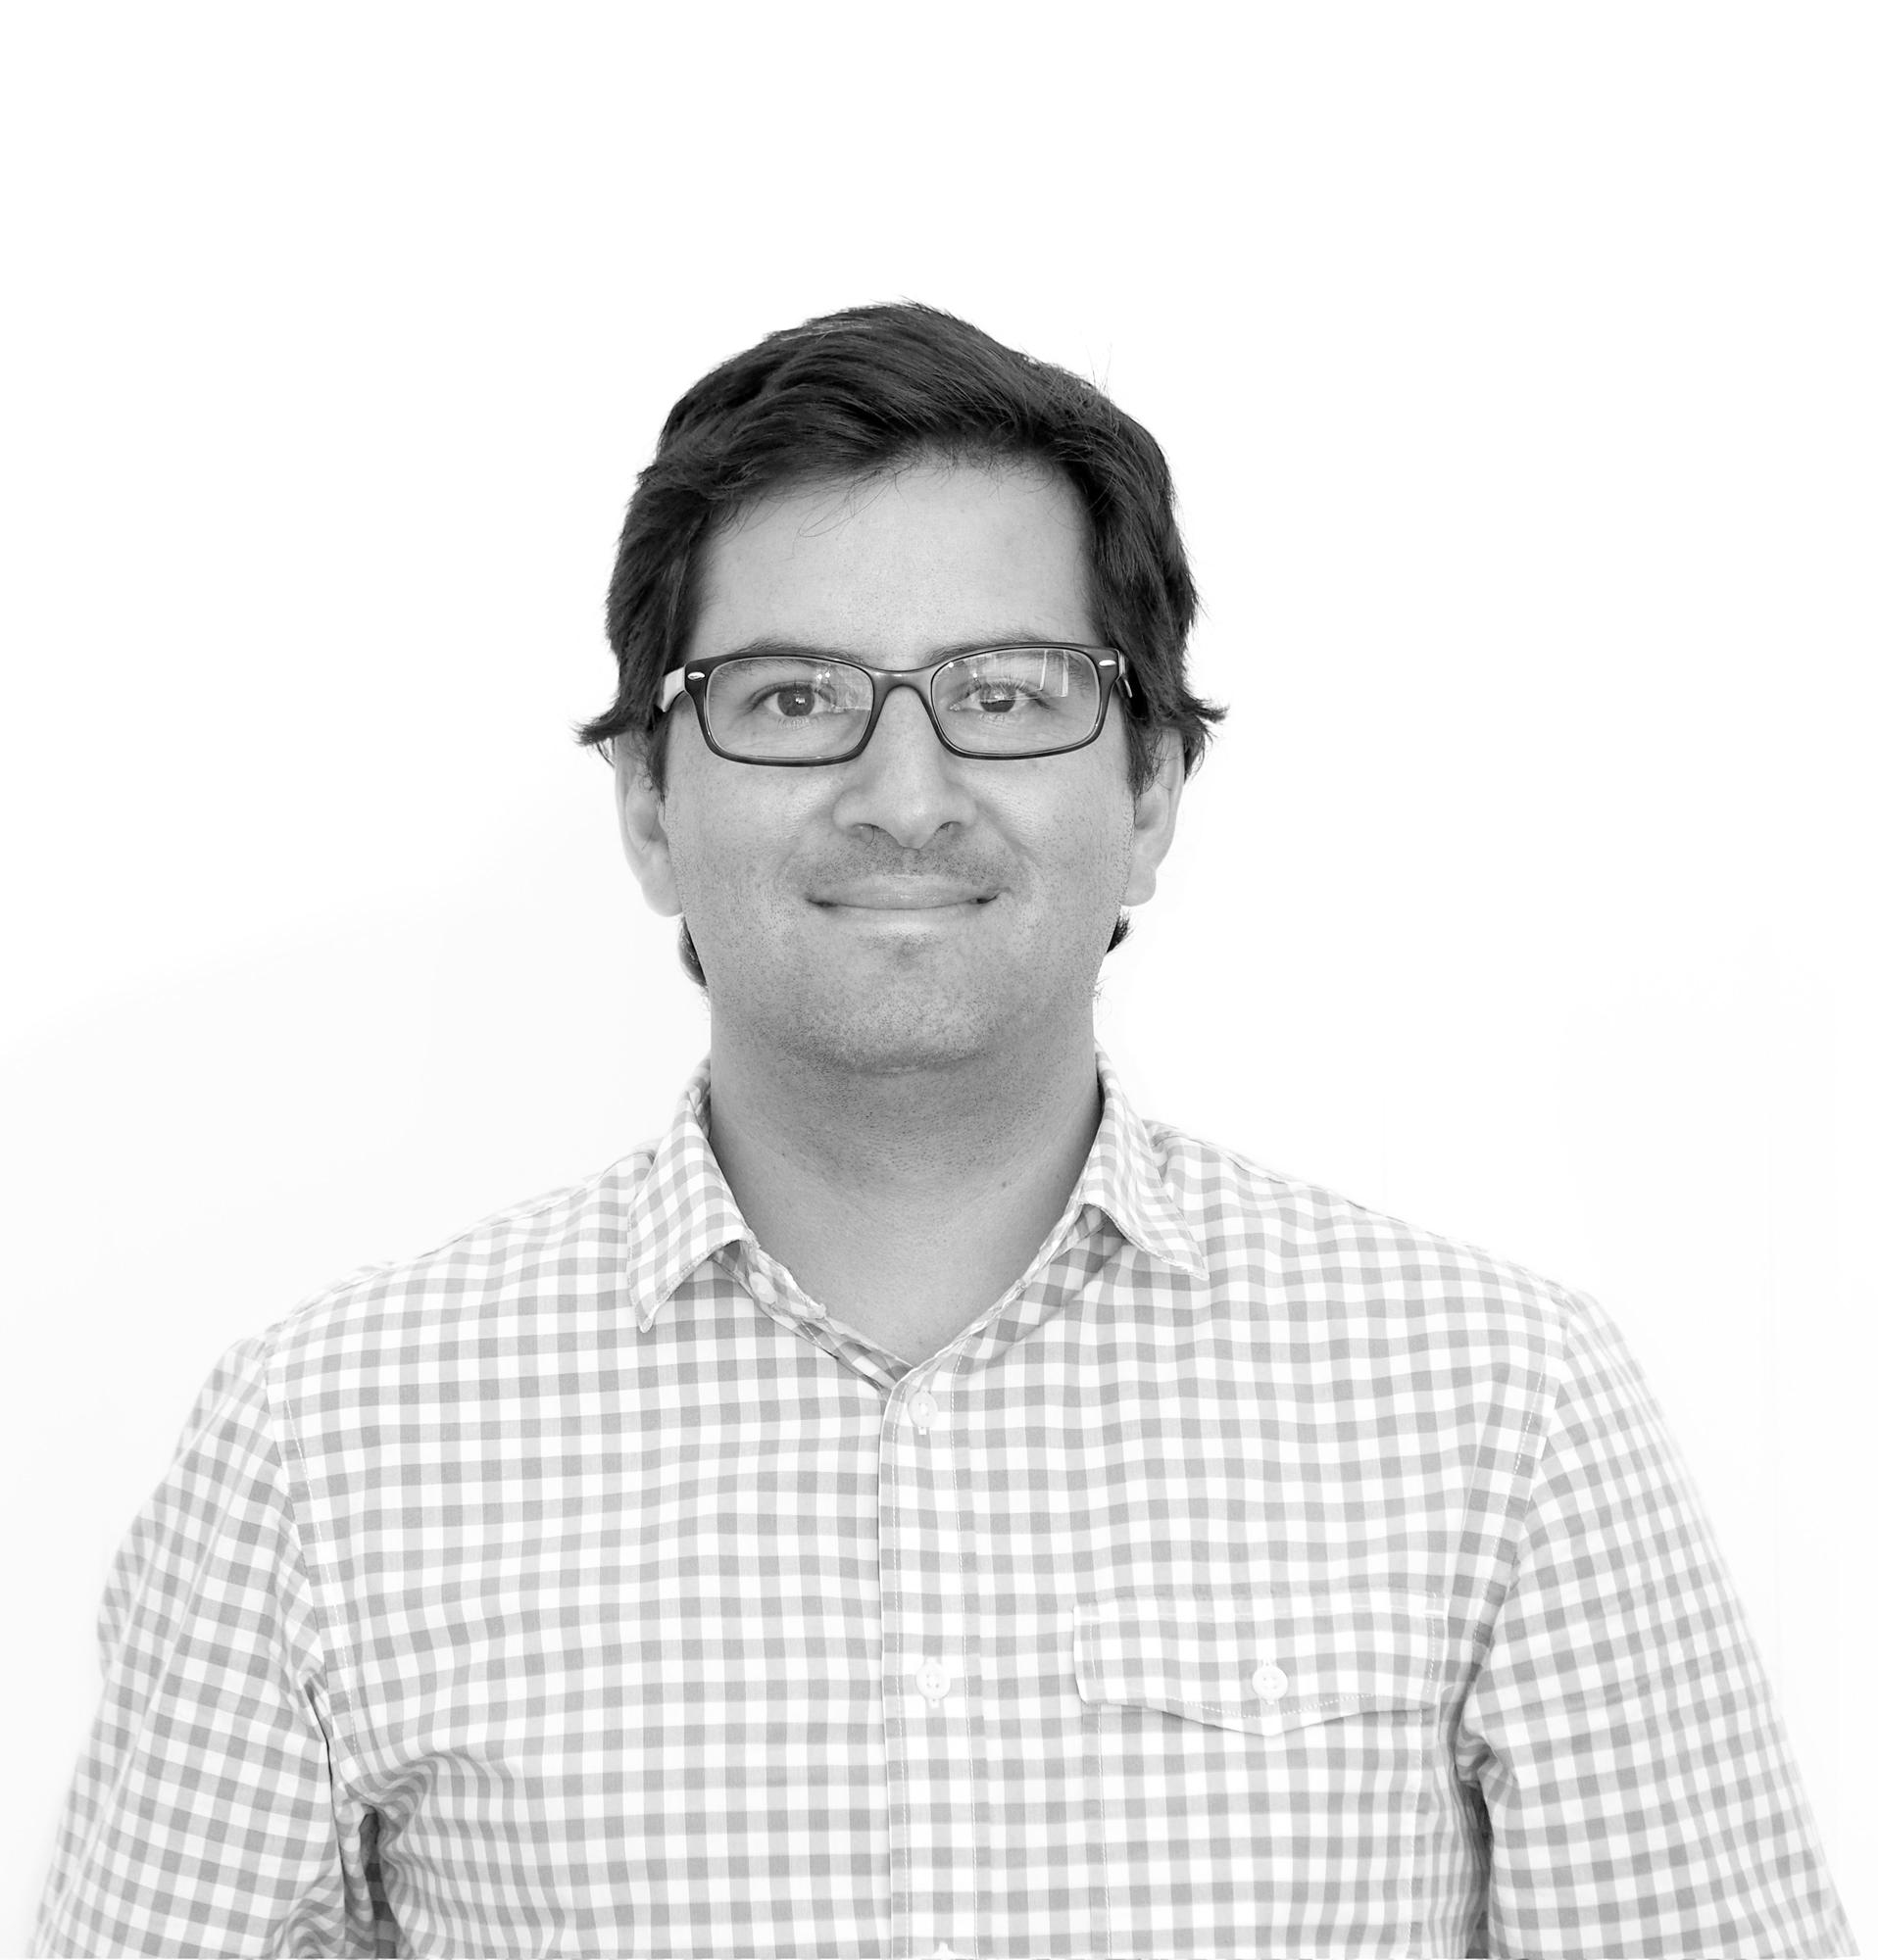 Jorge Sanchez Herrera